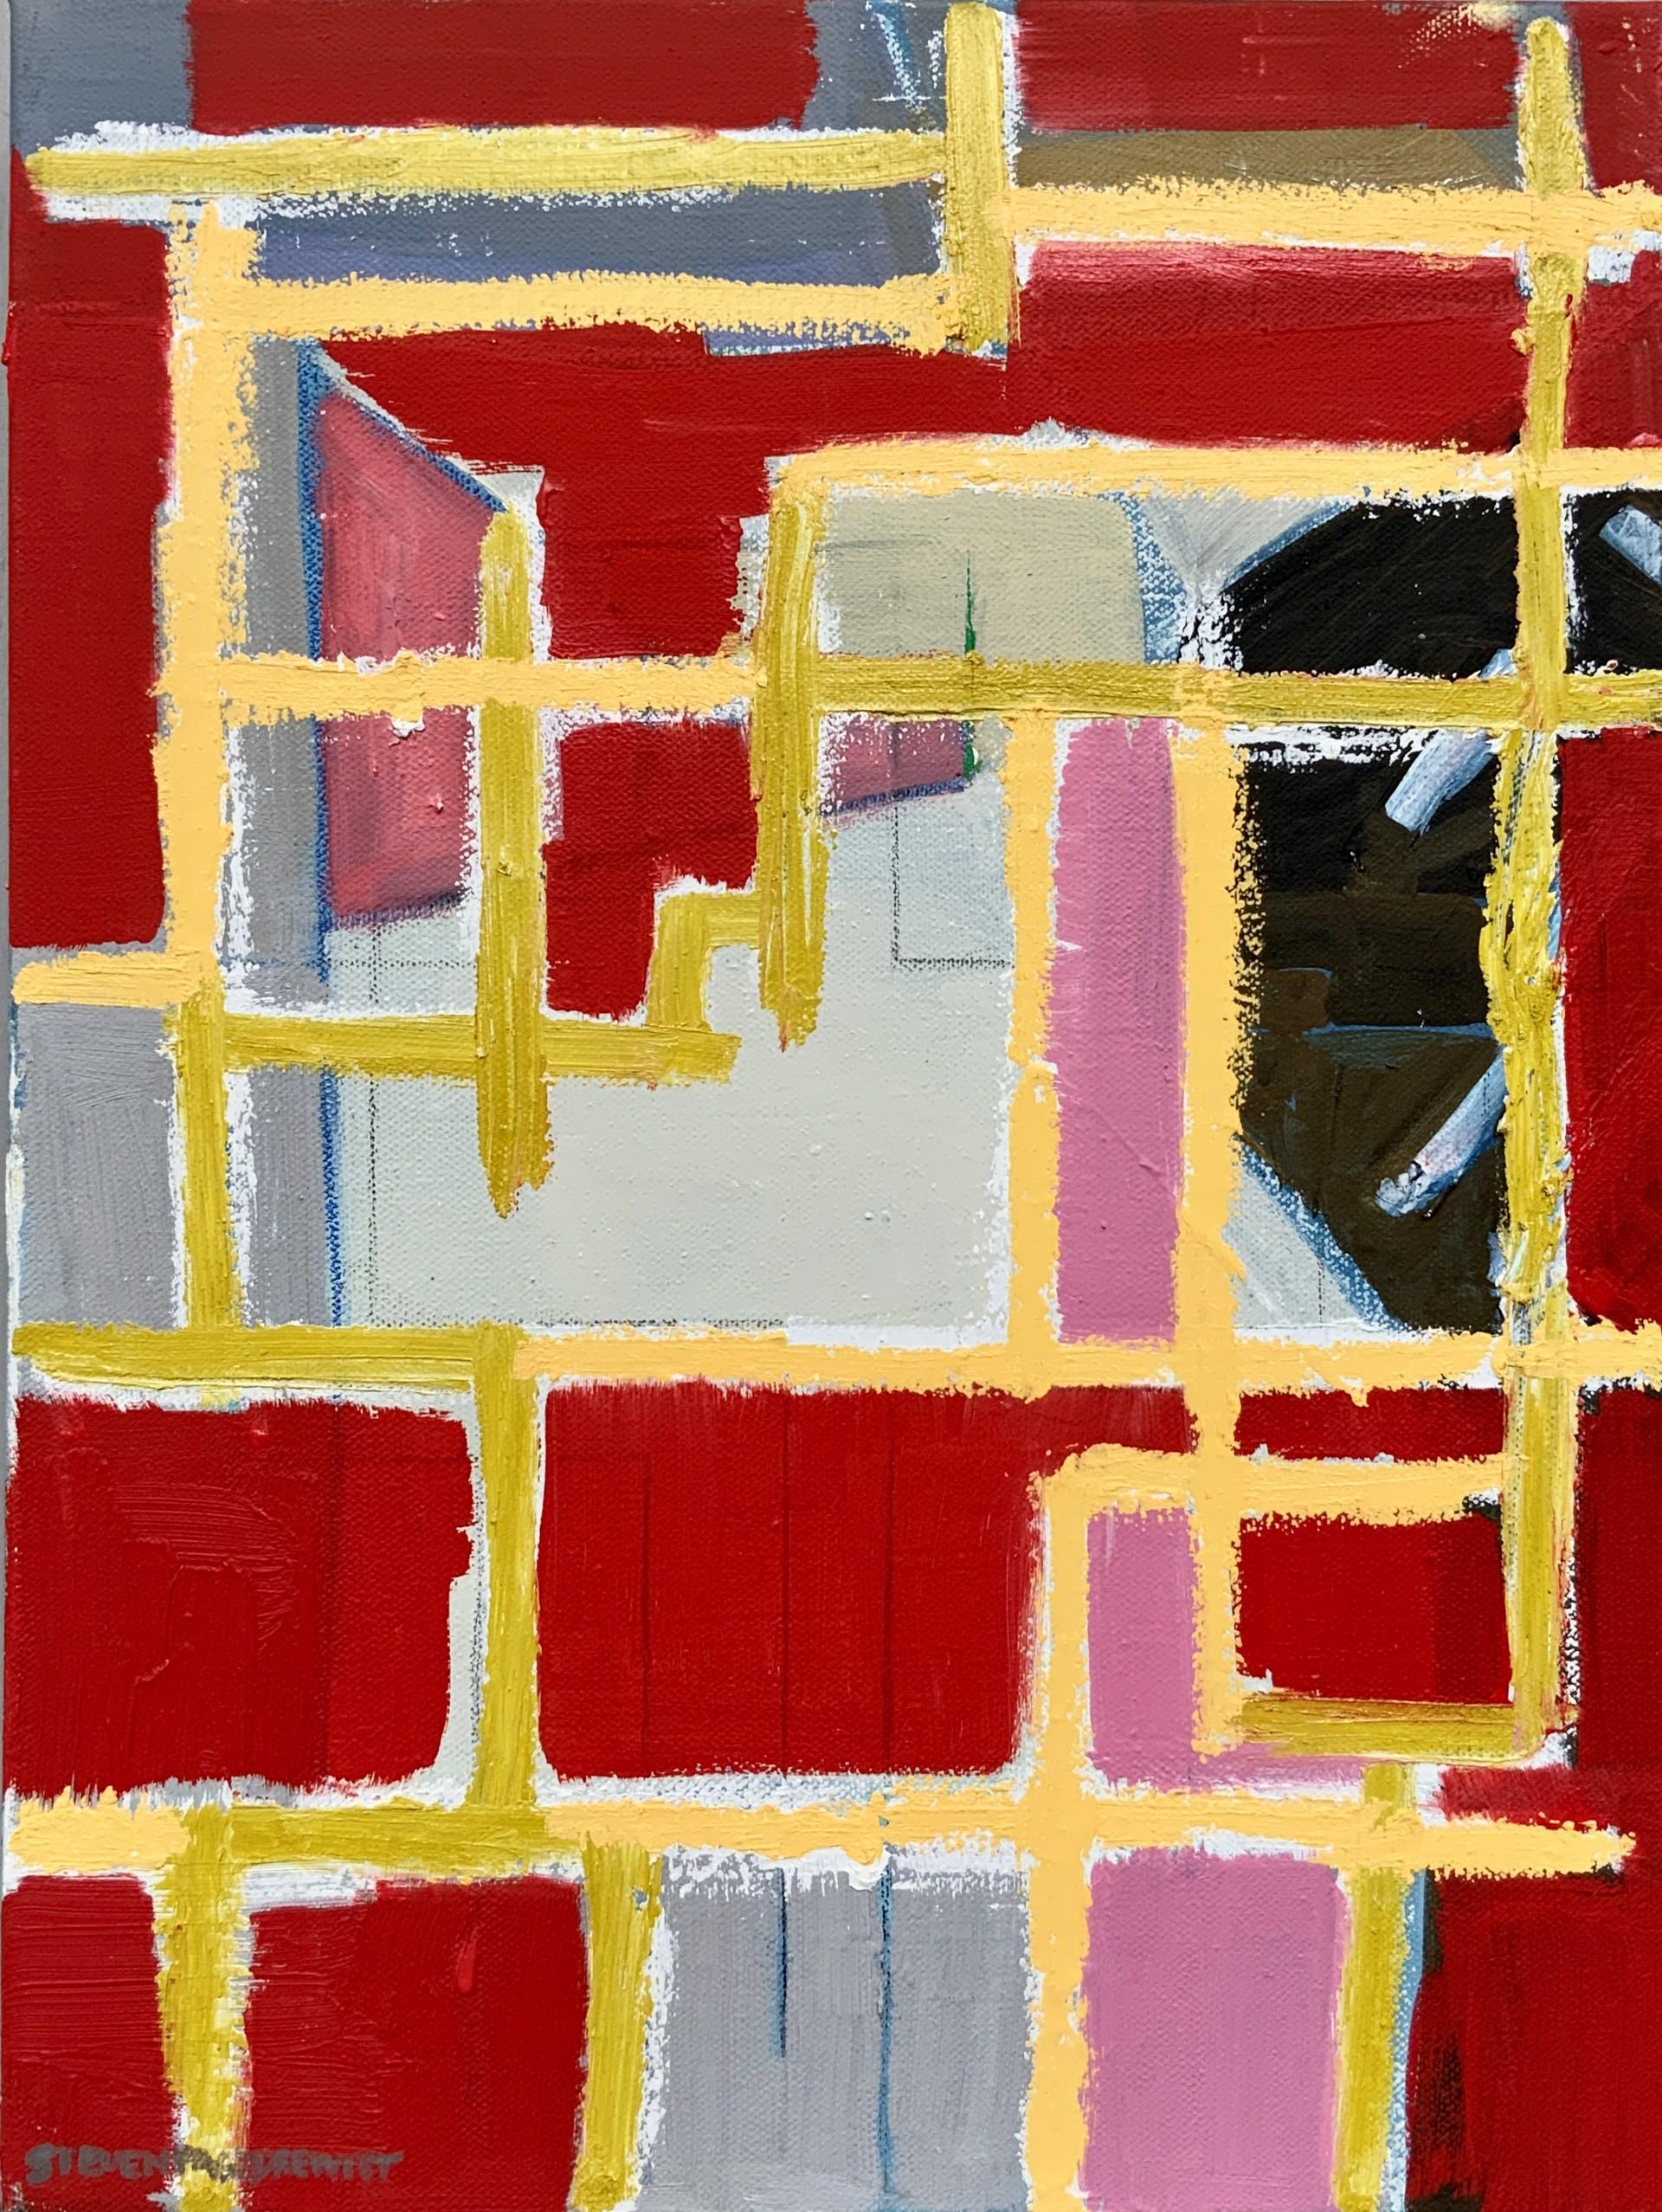 Socially Distanced 3 by Steven Page Prewitt